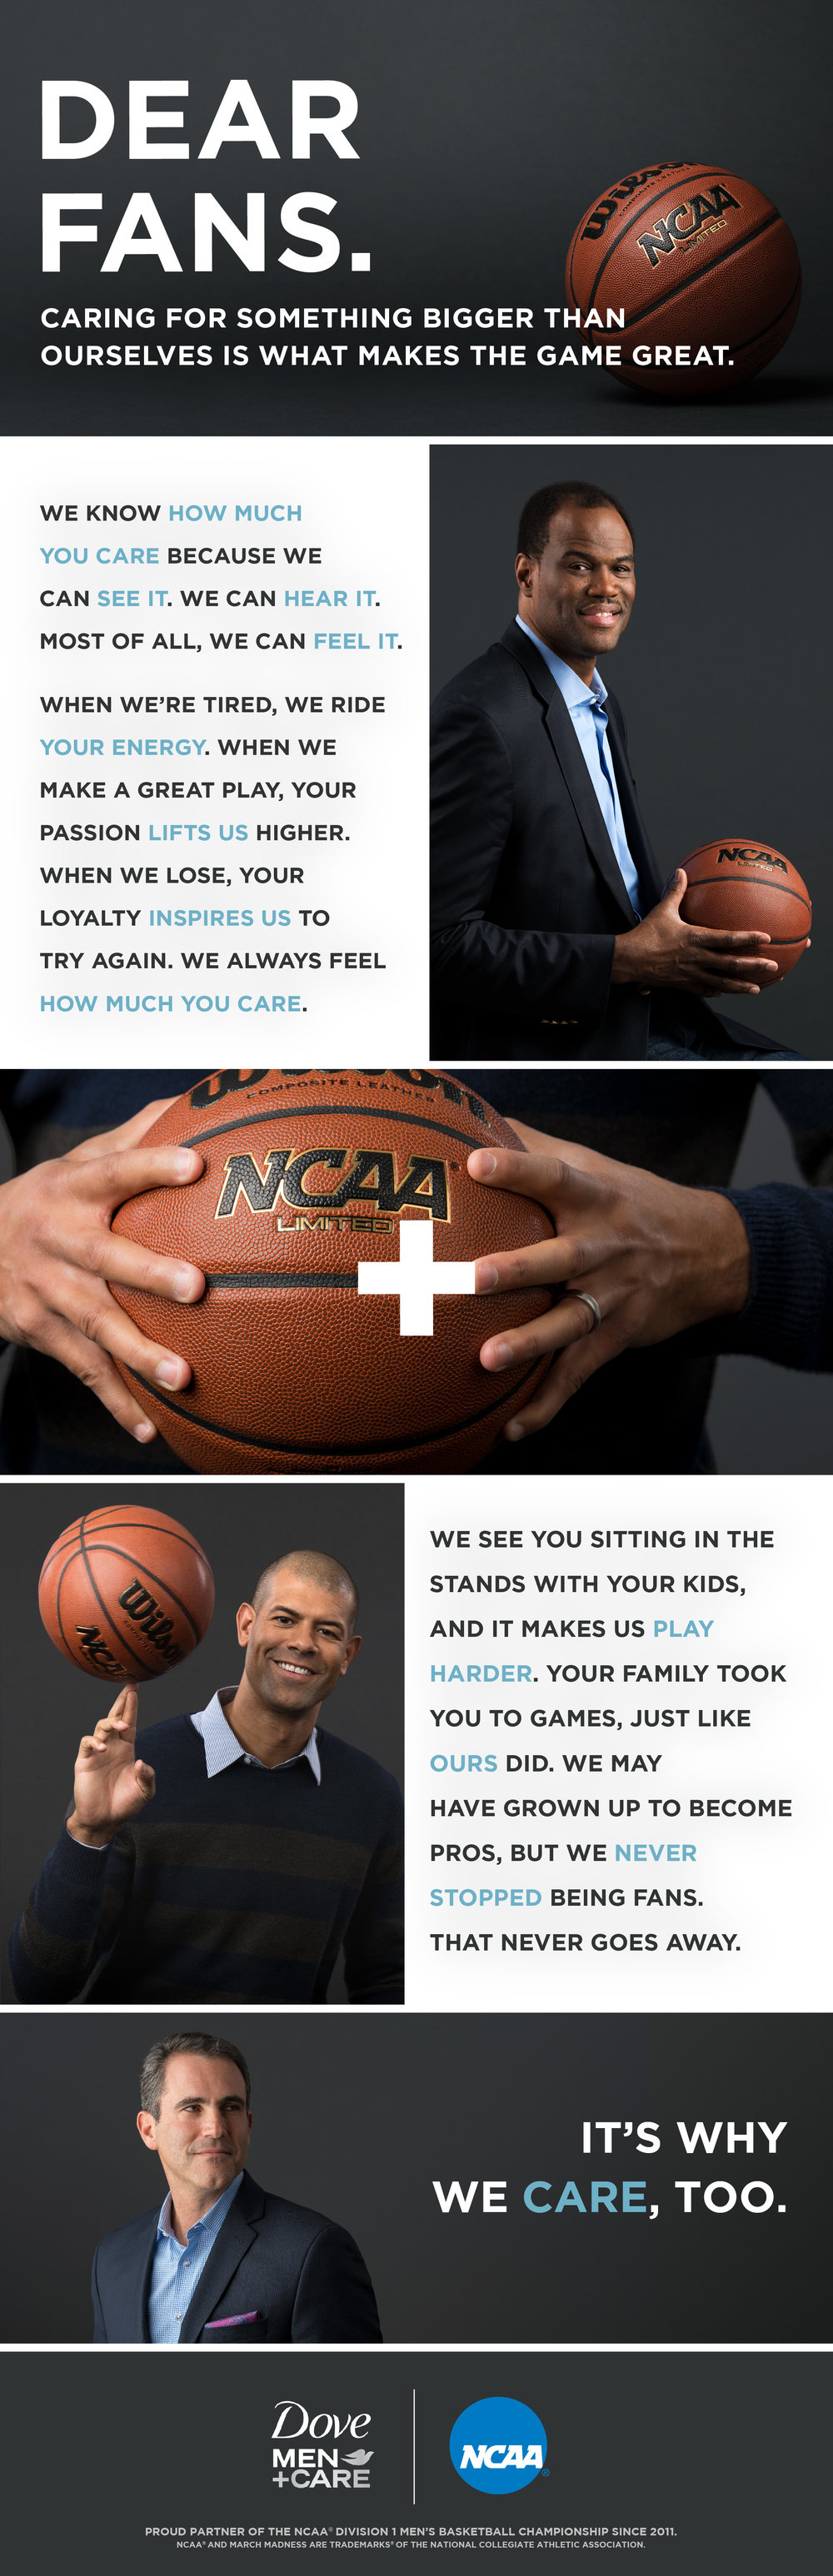 DMC NCAA18_Manifesto_Long Format_RetouchedImages_021218_FINAL COPY-01.jpg